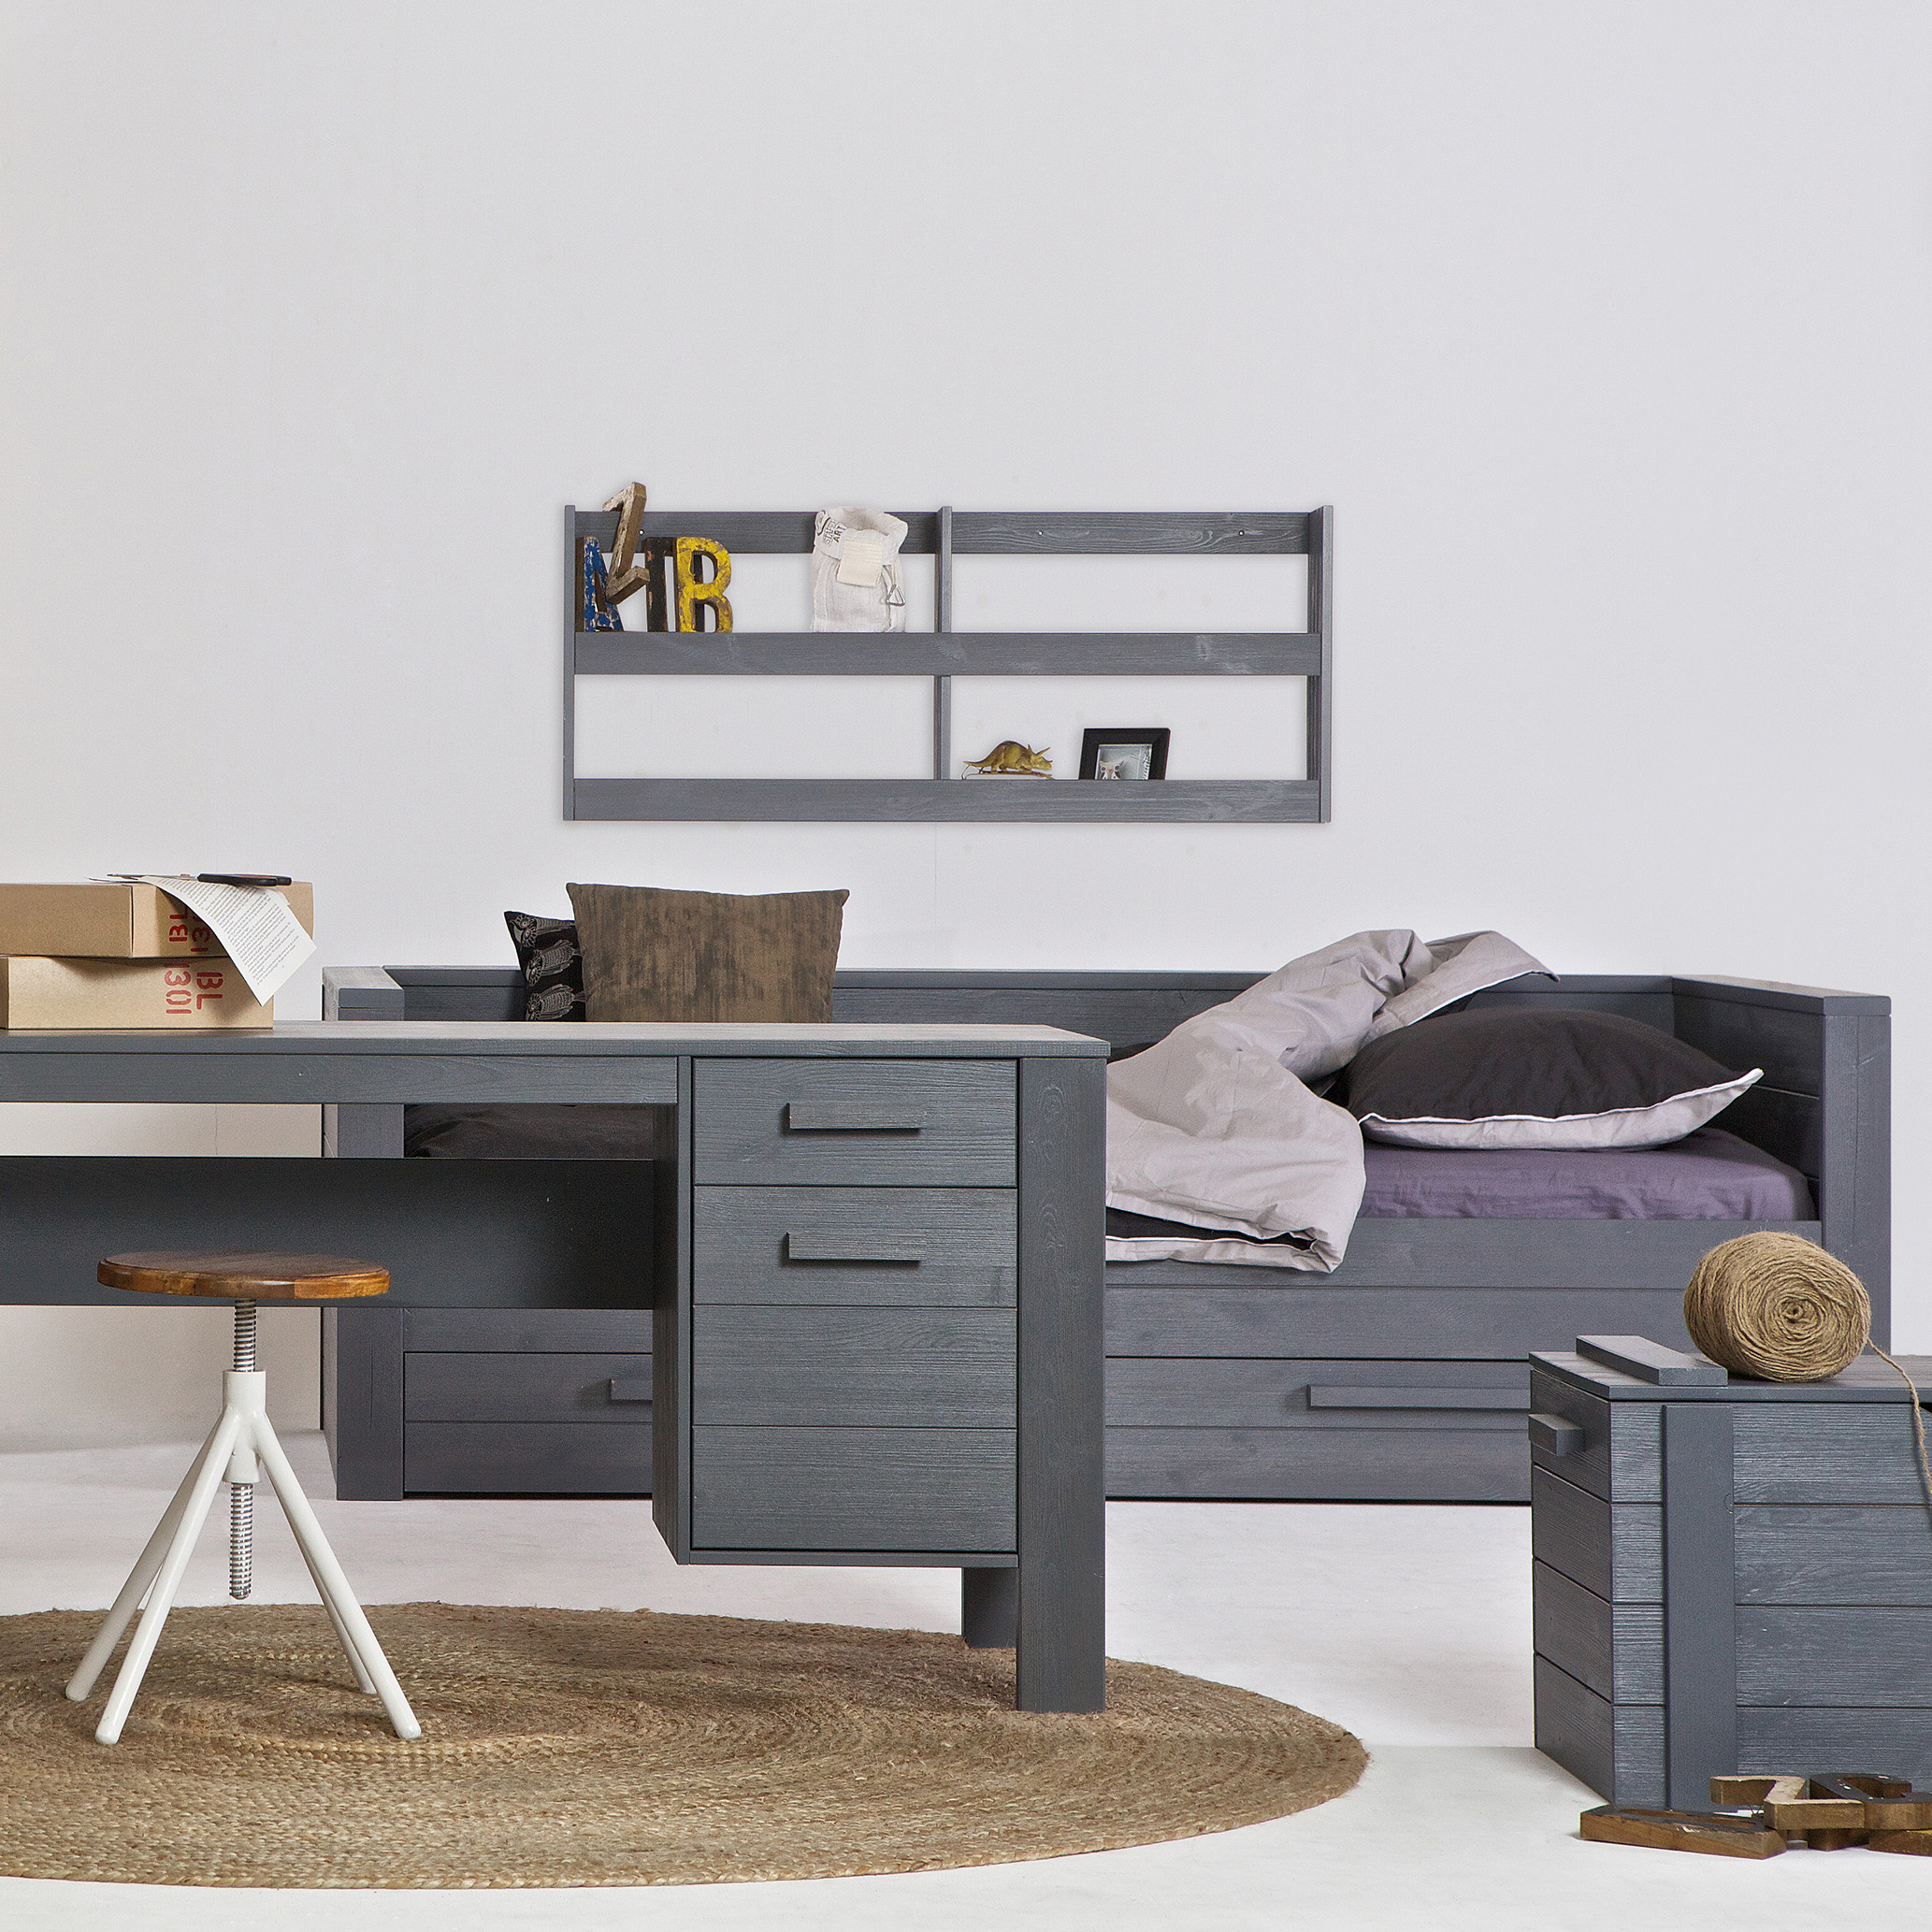 tagesbett holz free schrankbett x einzelbett holz wie neu. Black Bedroom Furniture Sets. Home Design Ideas